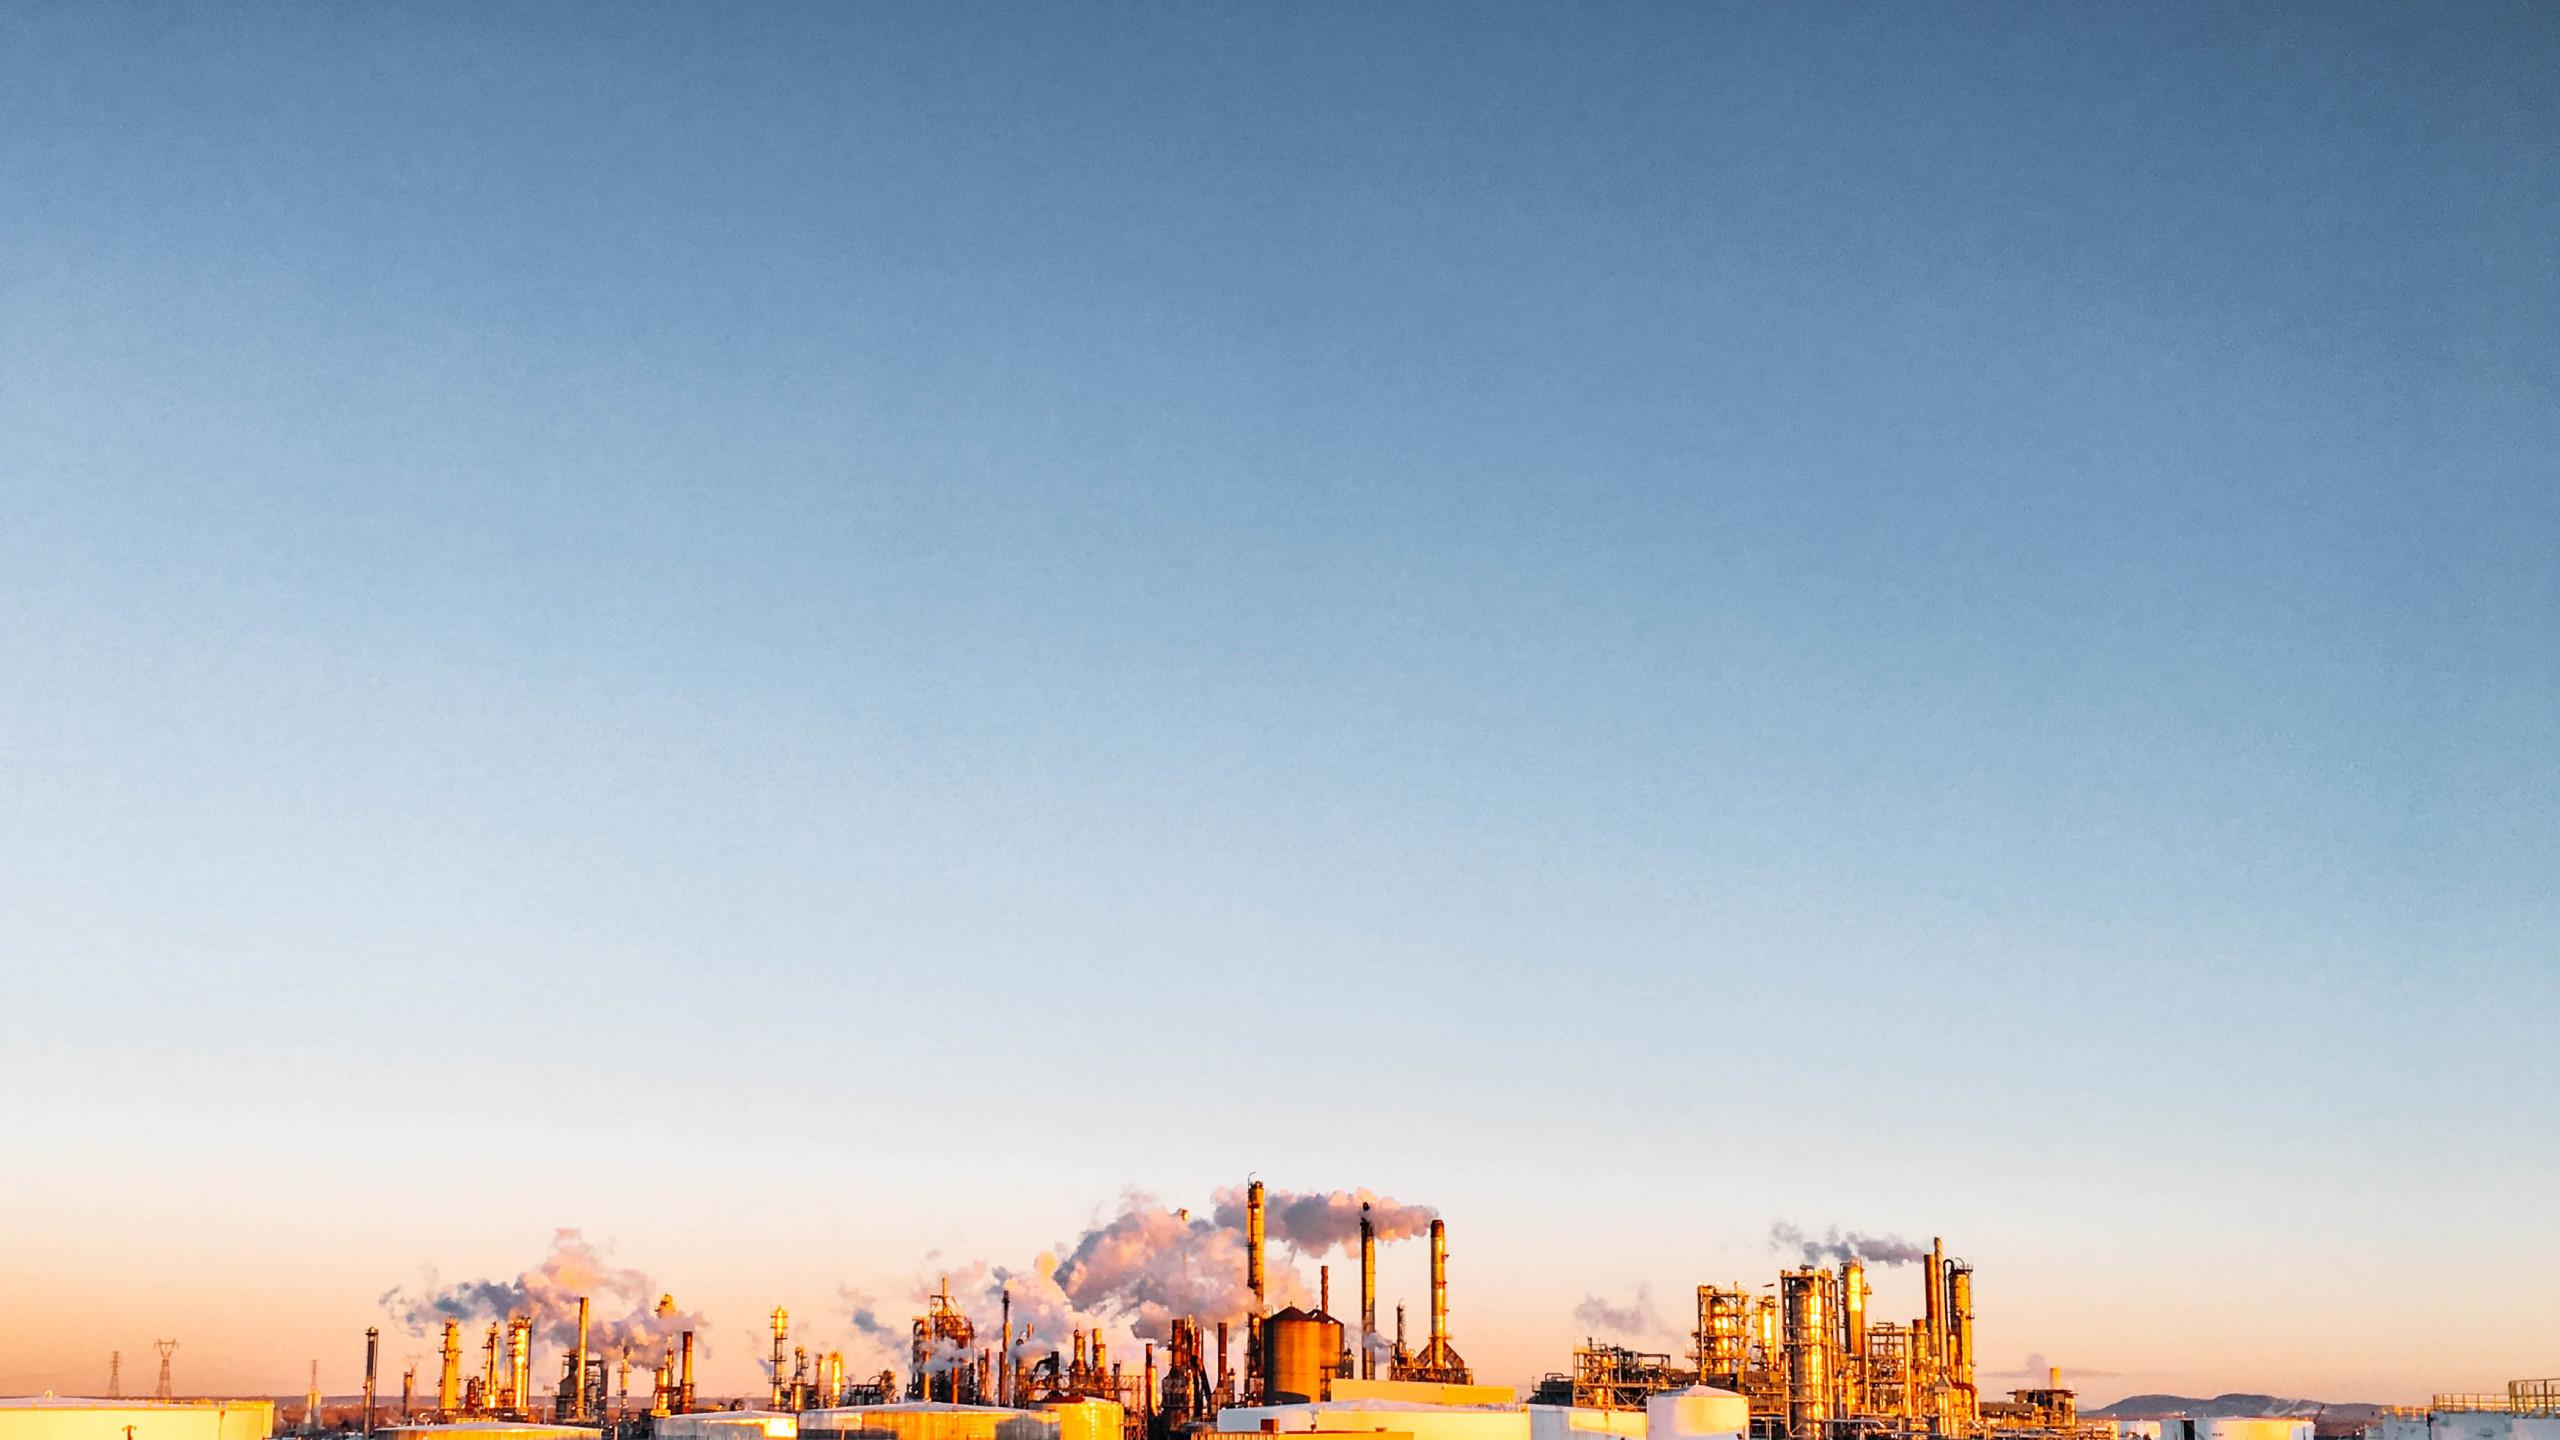 Crude price surges as us-iran conflict escalates